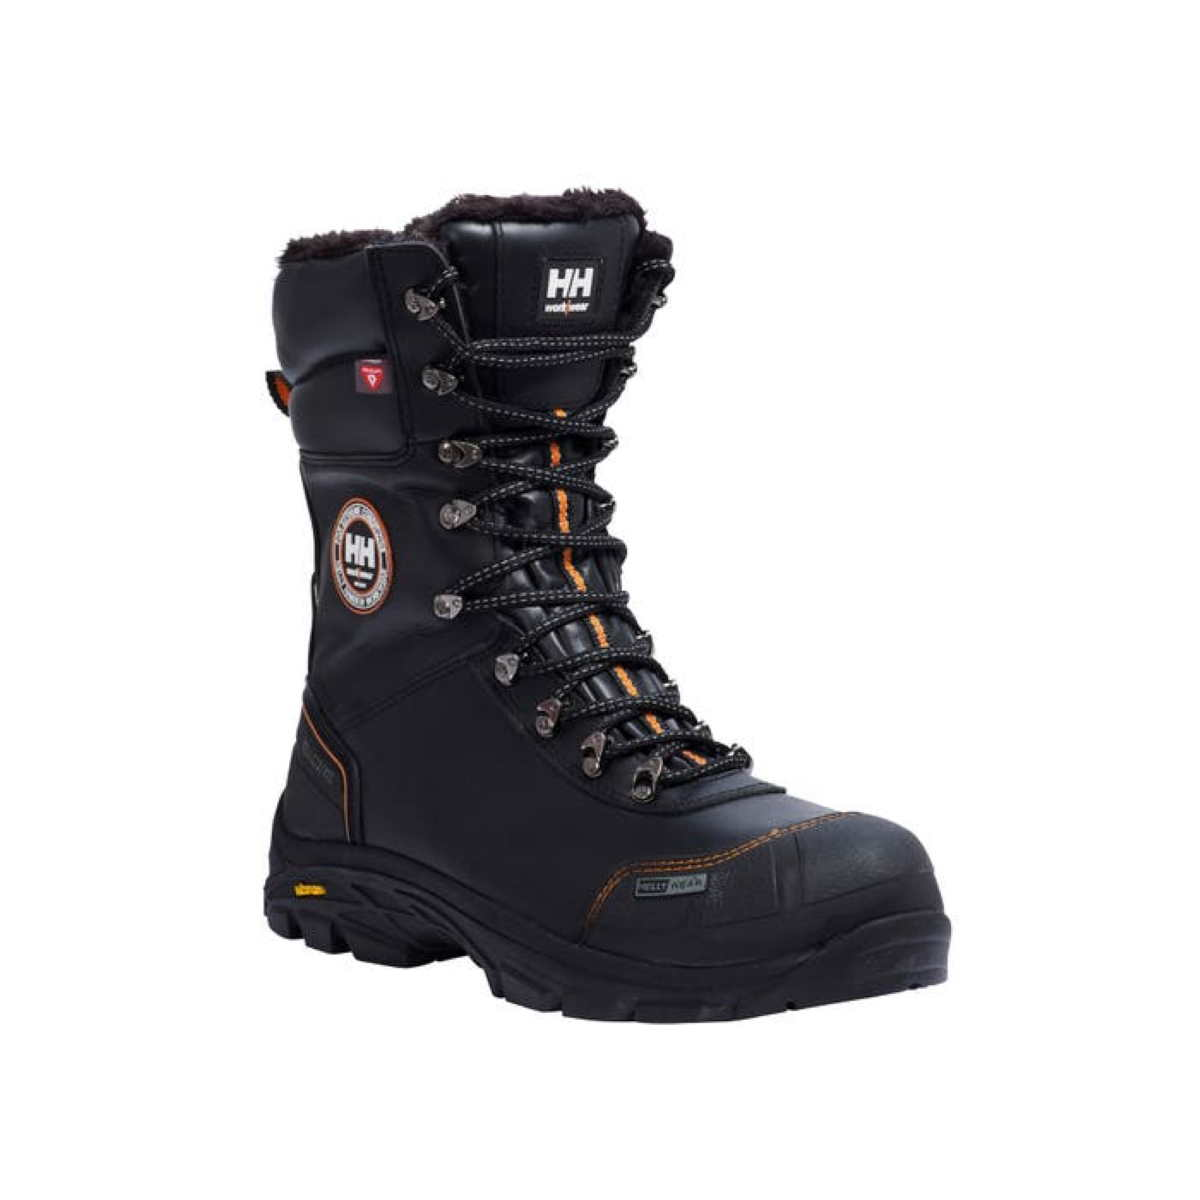 SF7830 Helly Hansen Chelsea Waterproof Winter Boot